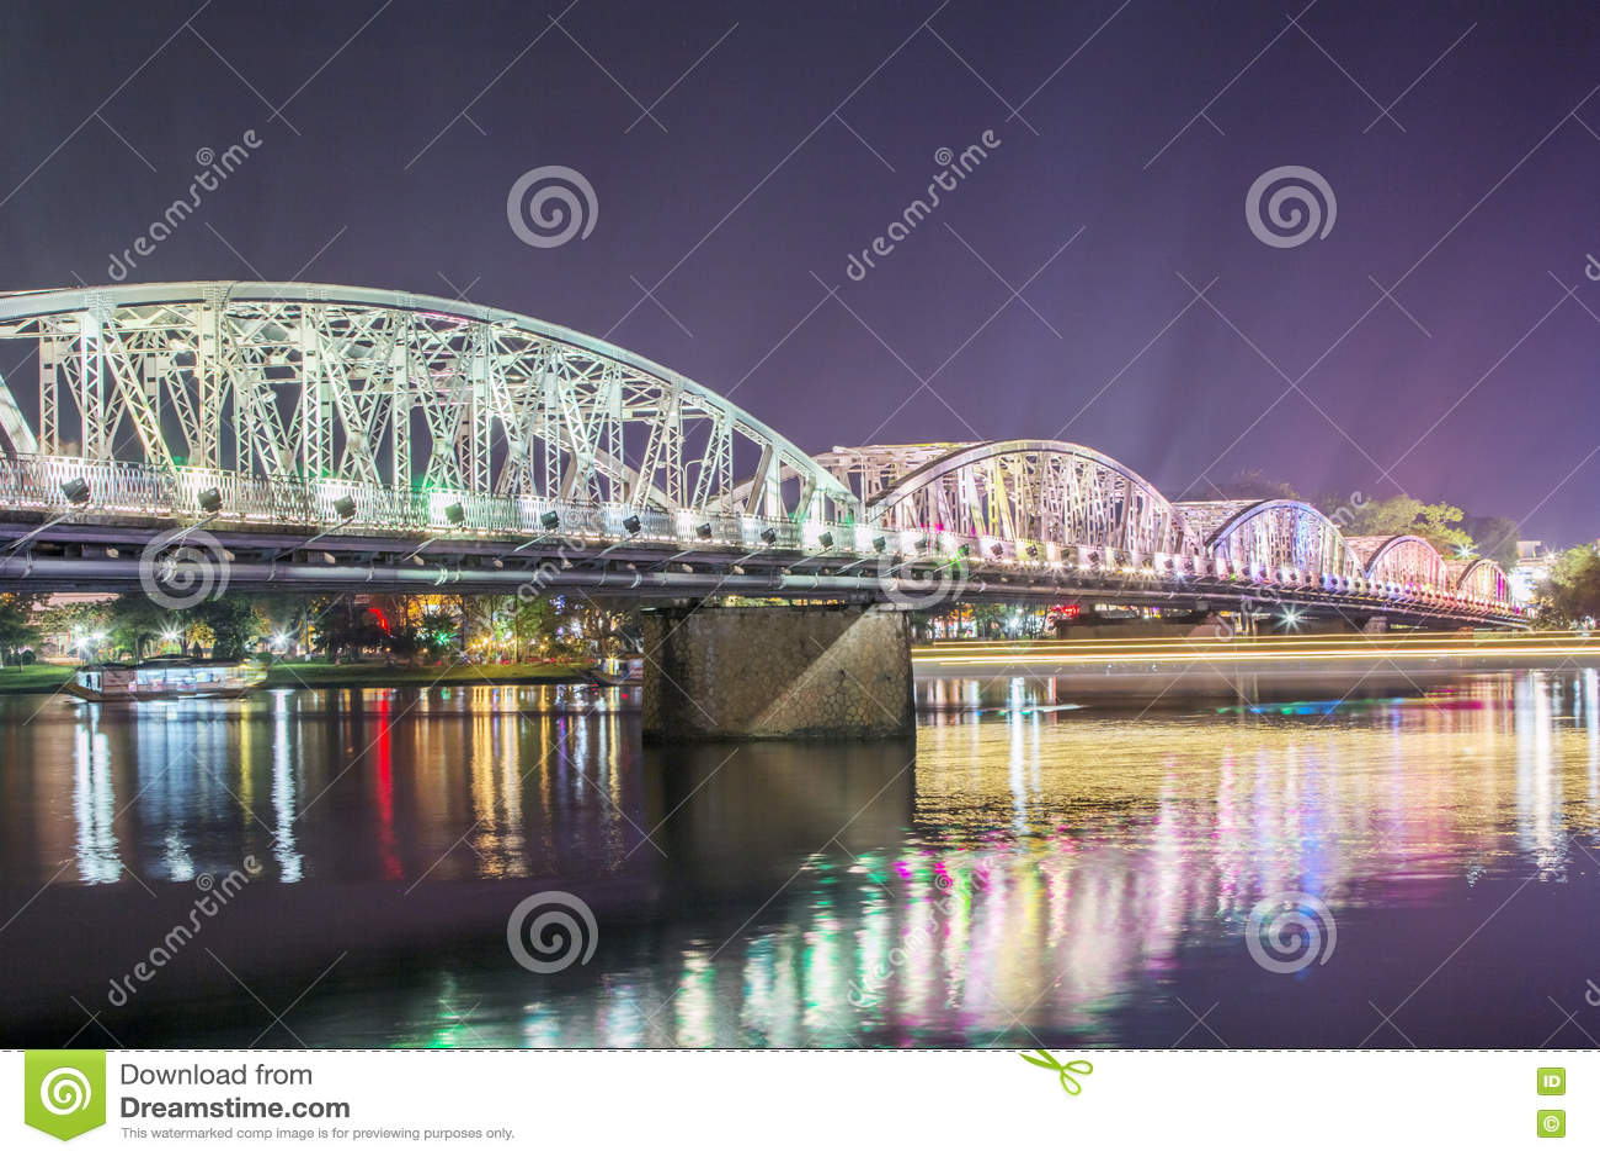 Truong连队桥梁夜视图在颜色的